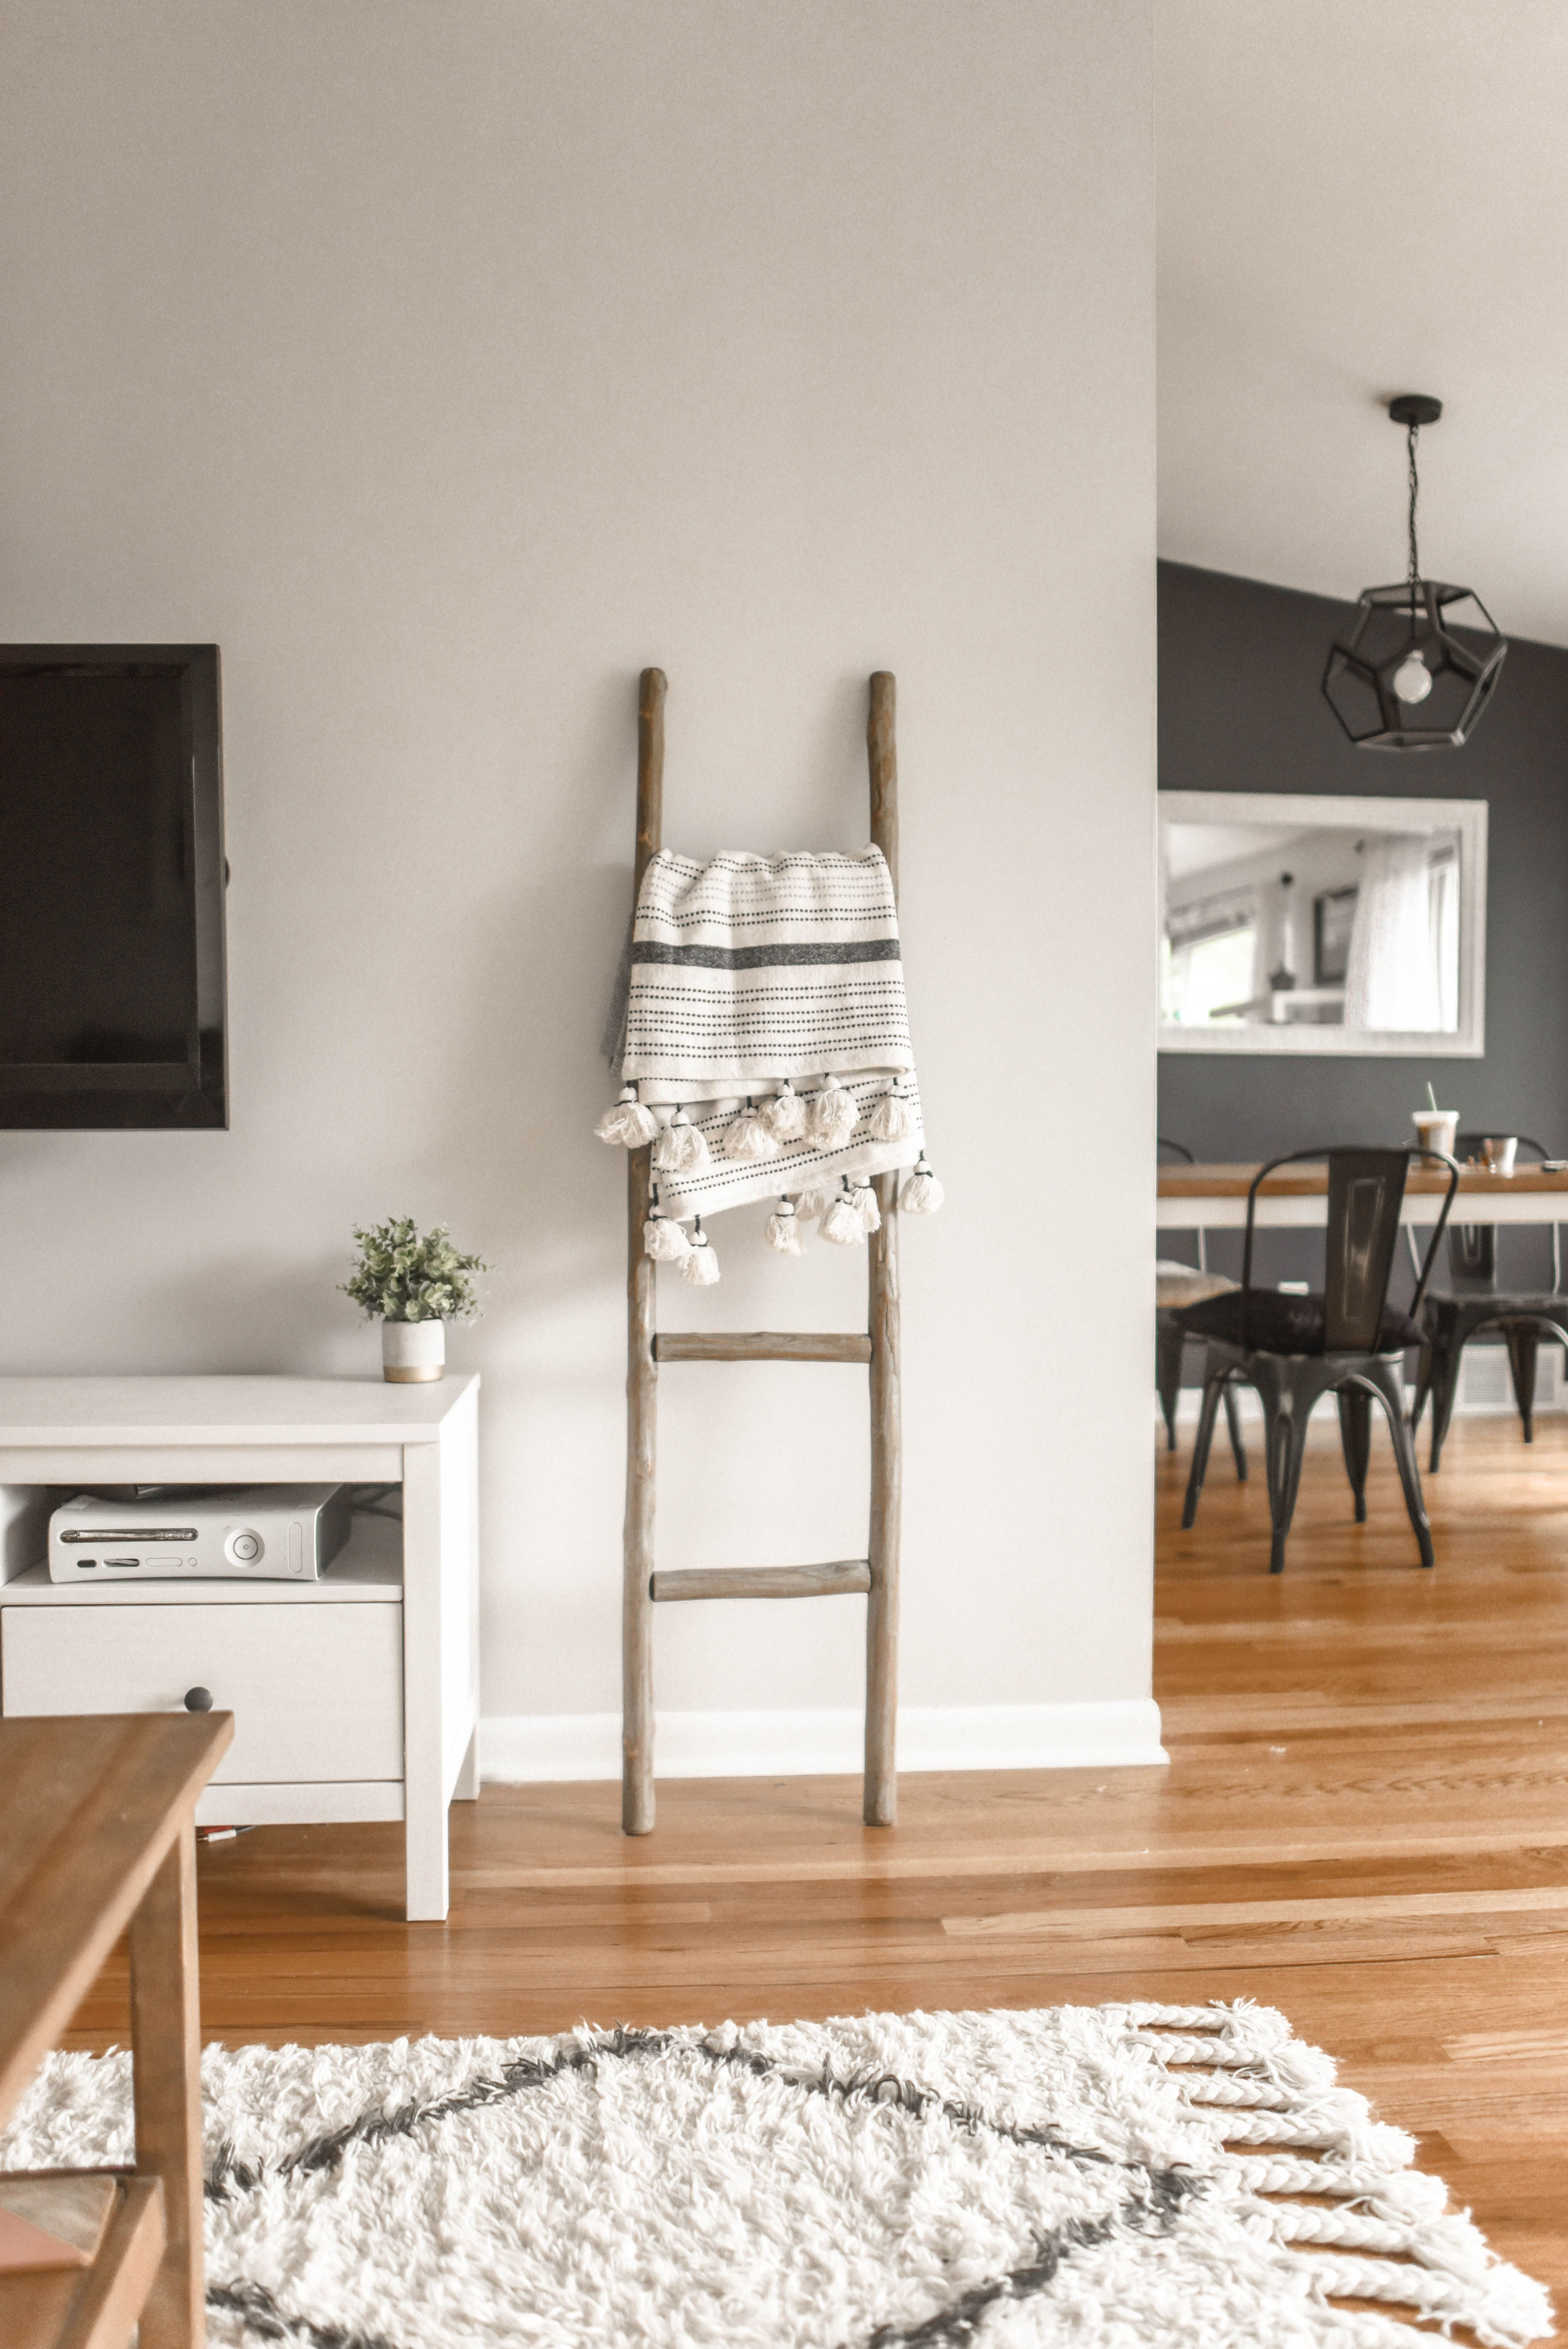 50 SUMMER 2018 SCANDINAVIAN INTERIOR DESIGN IDEAS | interiors ...